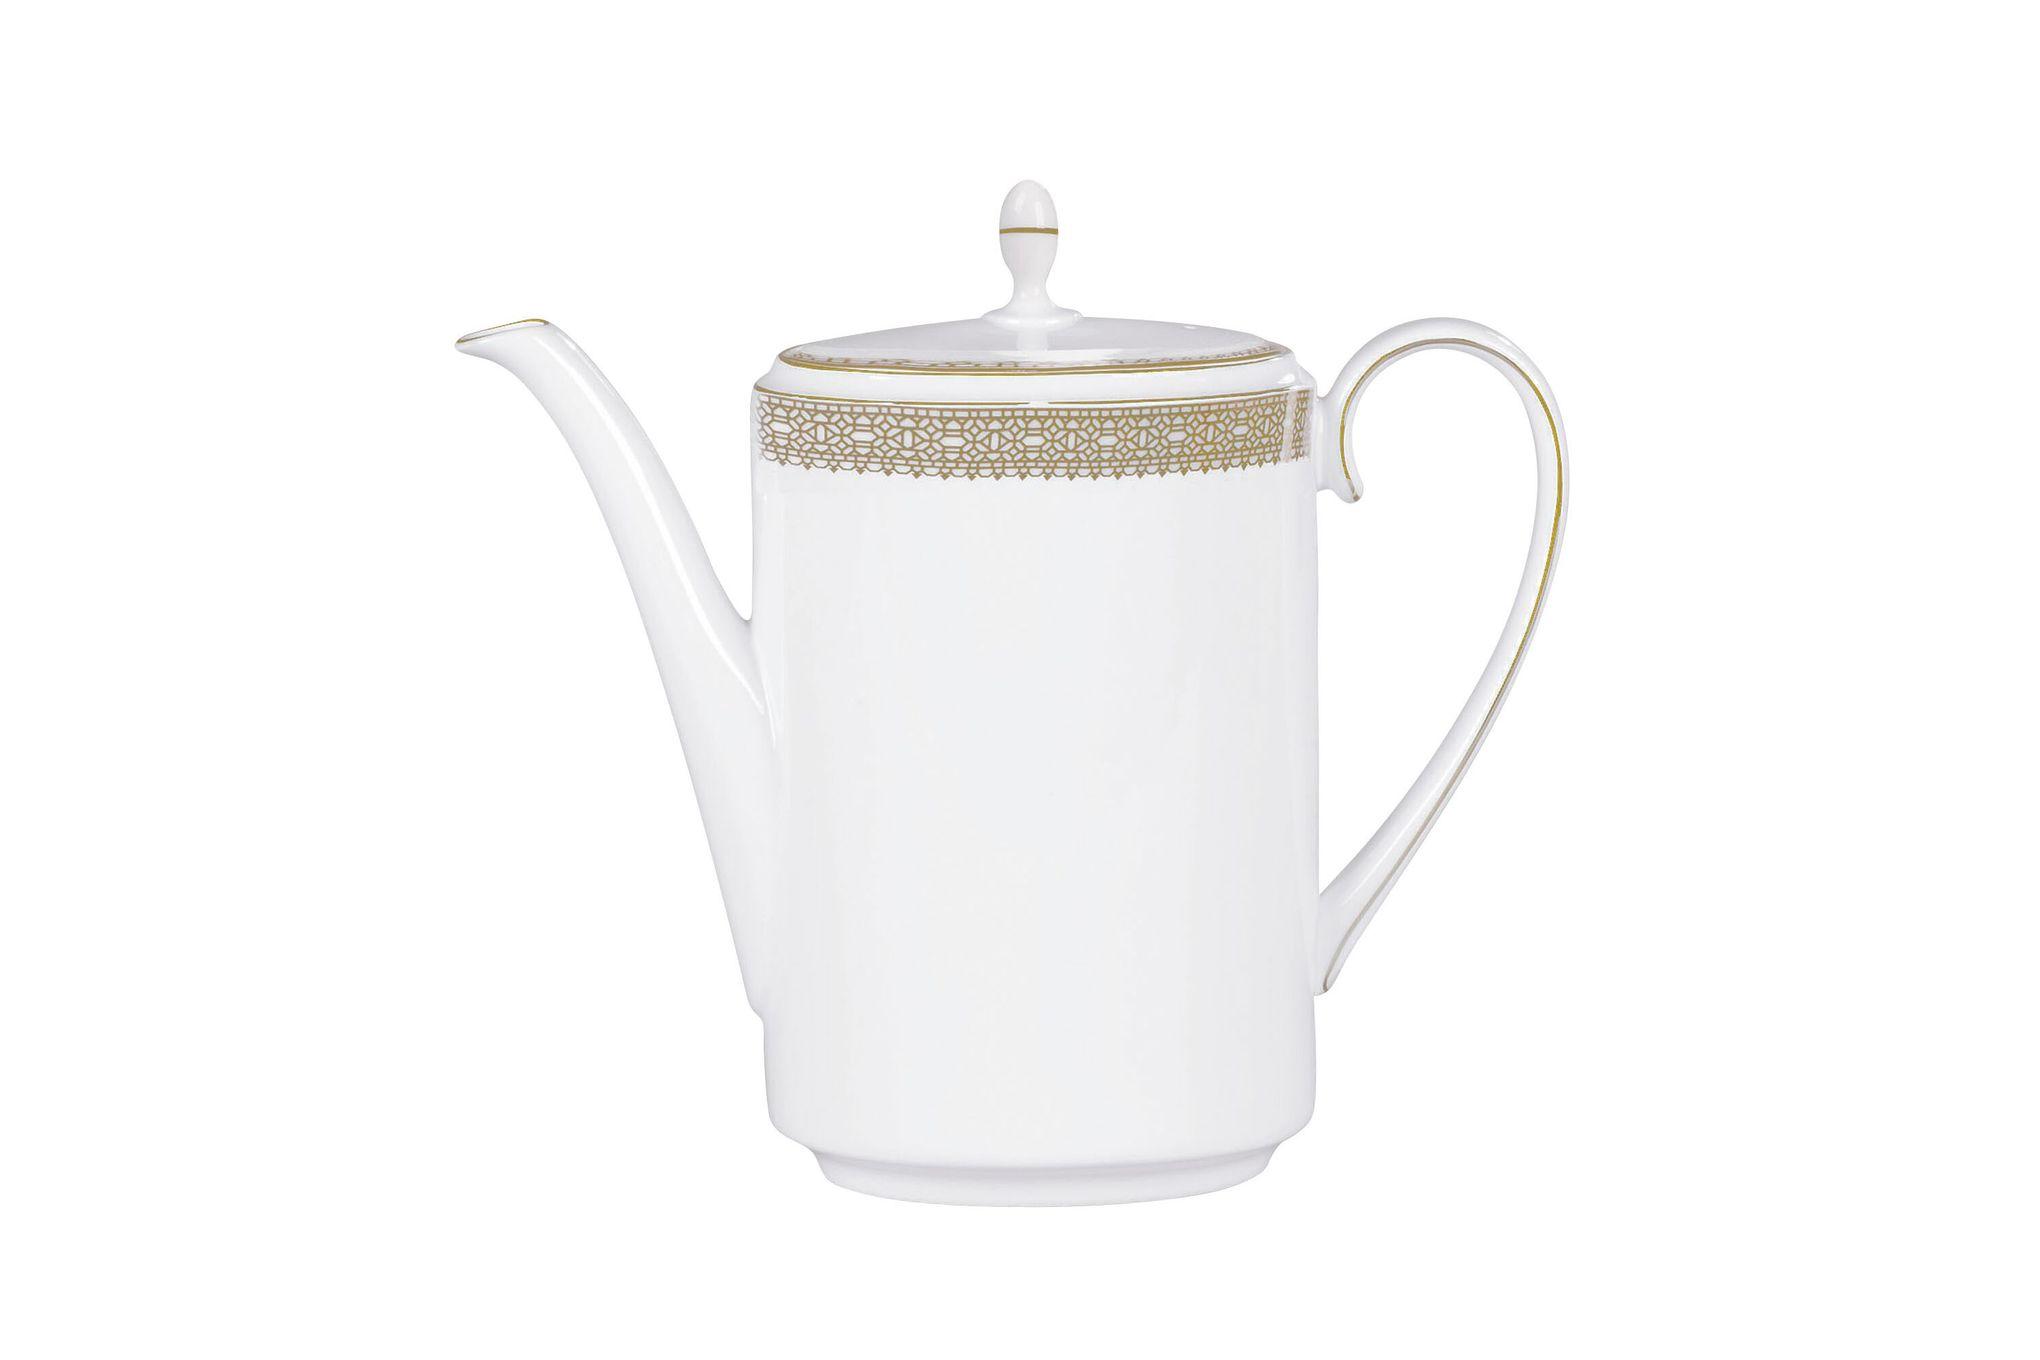 Vera Wang for Wedgwood Lace Gold Coffee Pot 0.75l thumb 1